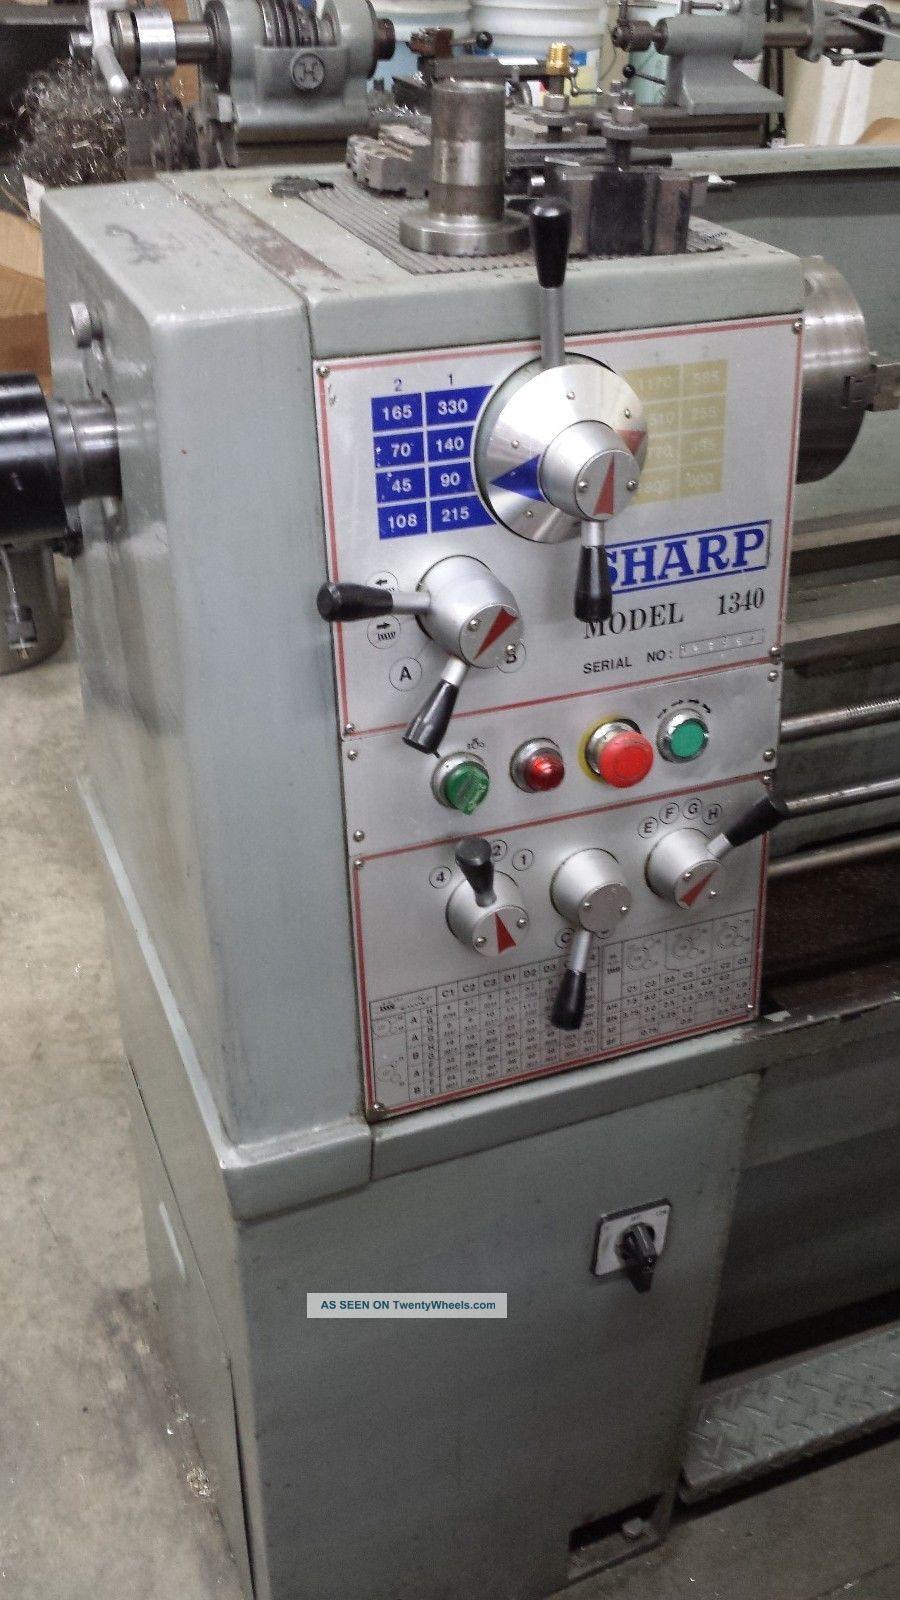 Sharp Precision Engine Gap Lathe Model 1340